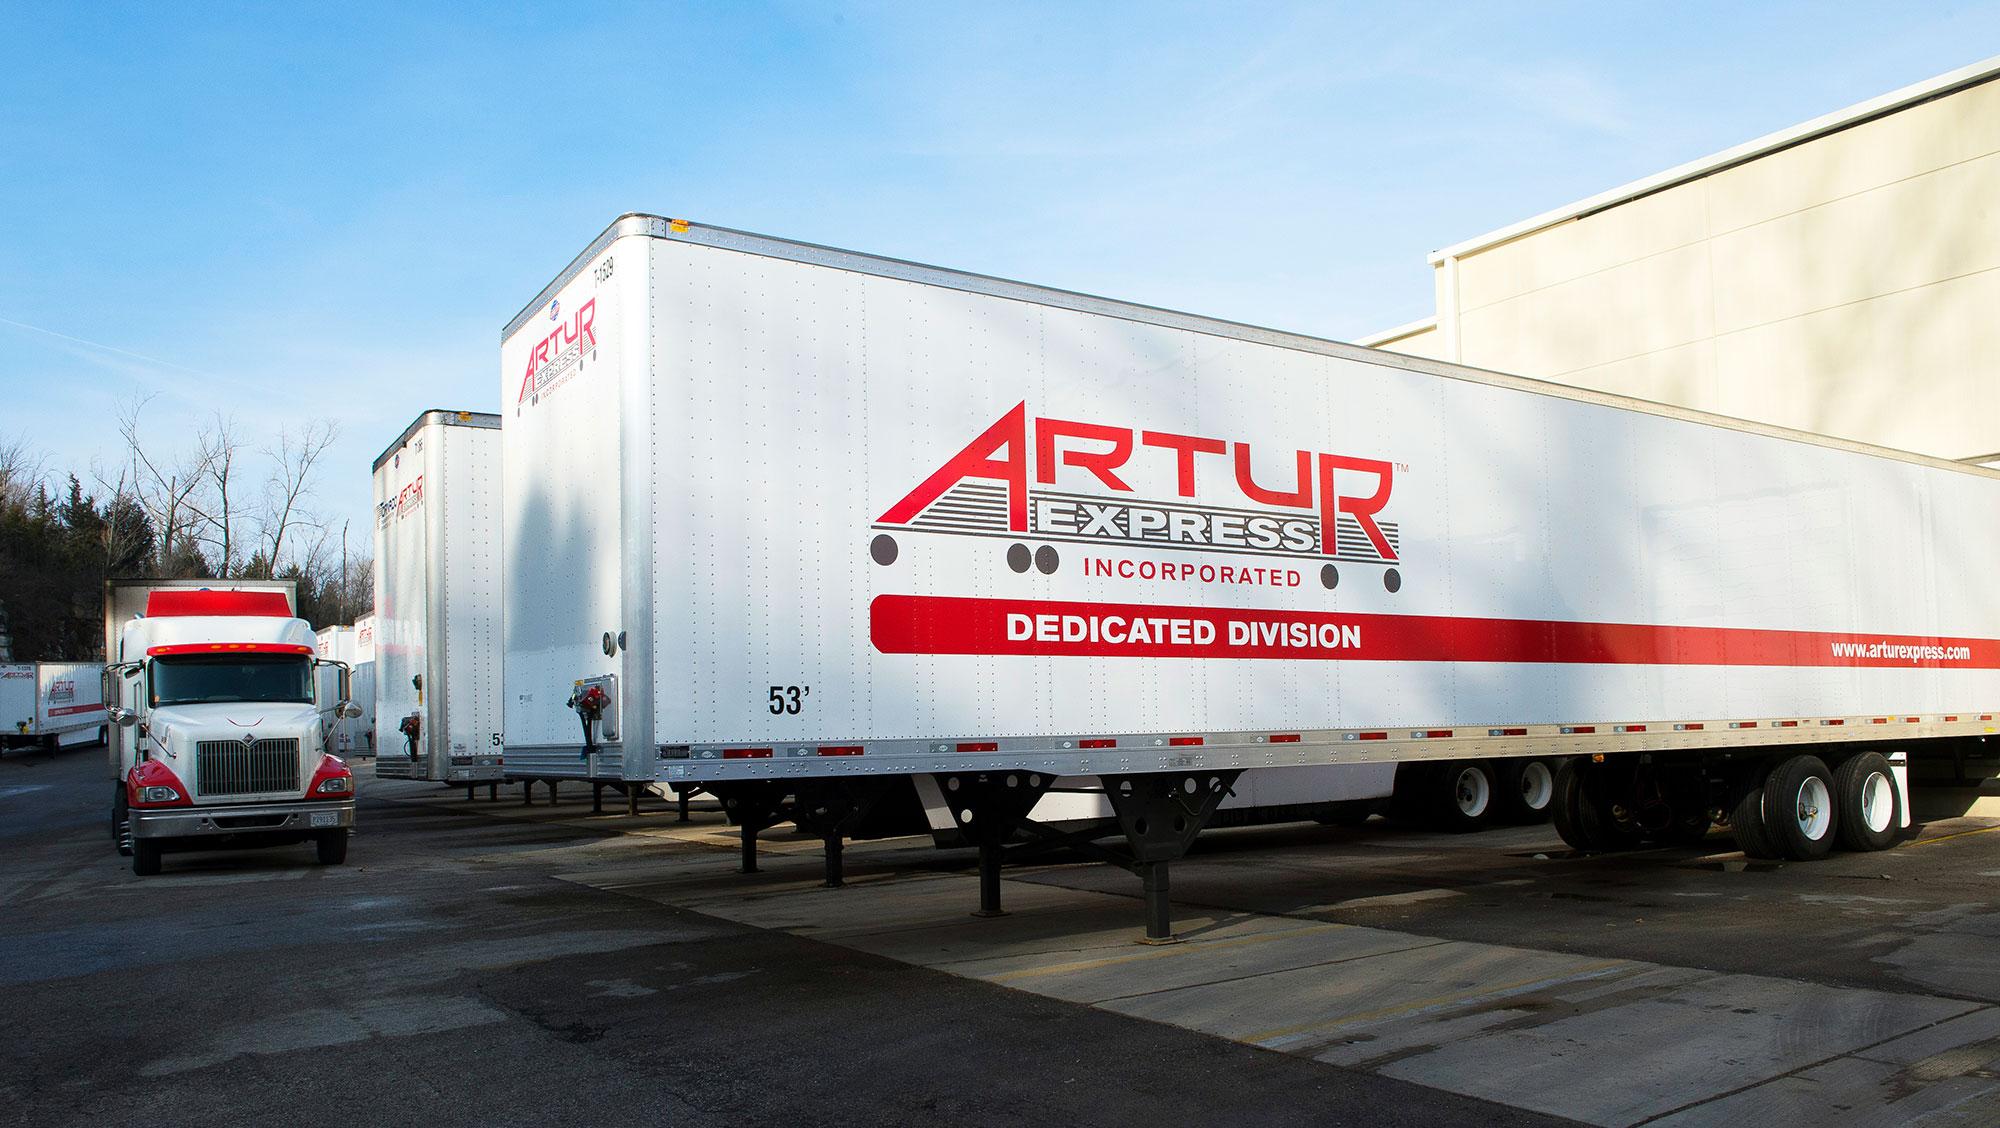 artur trailer image